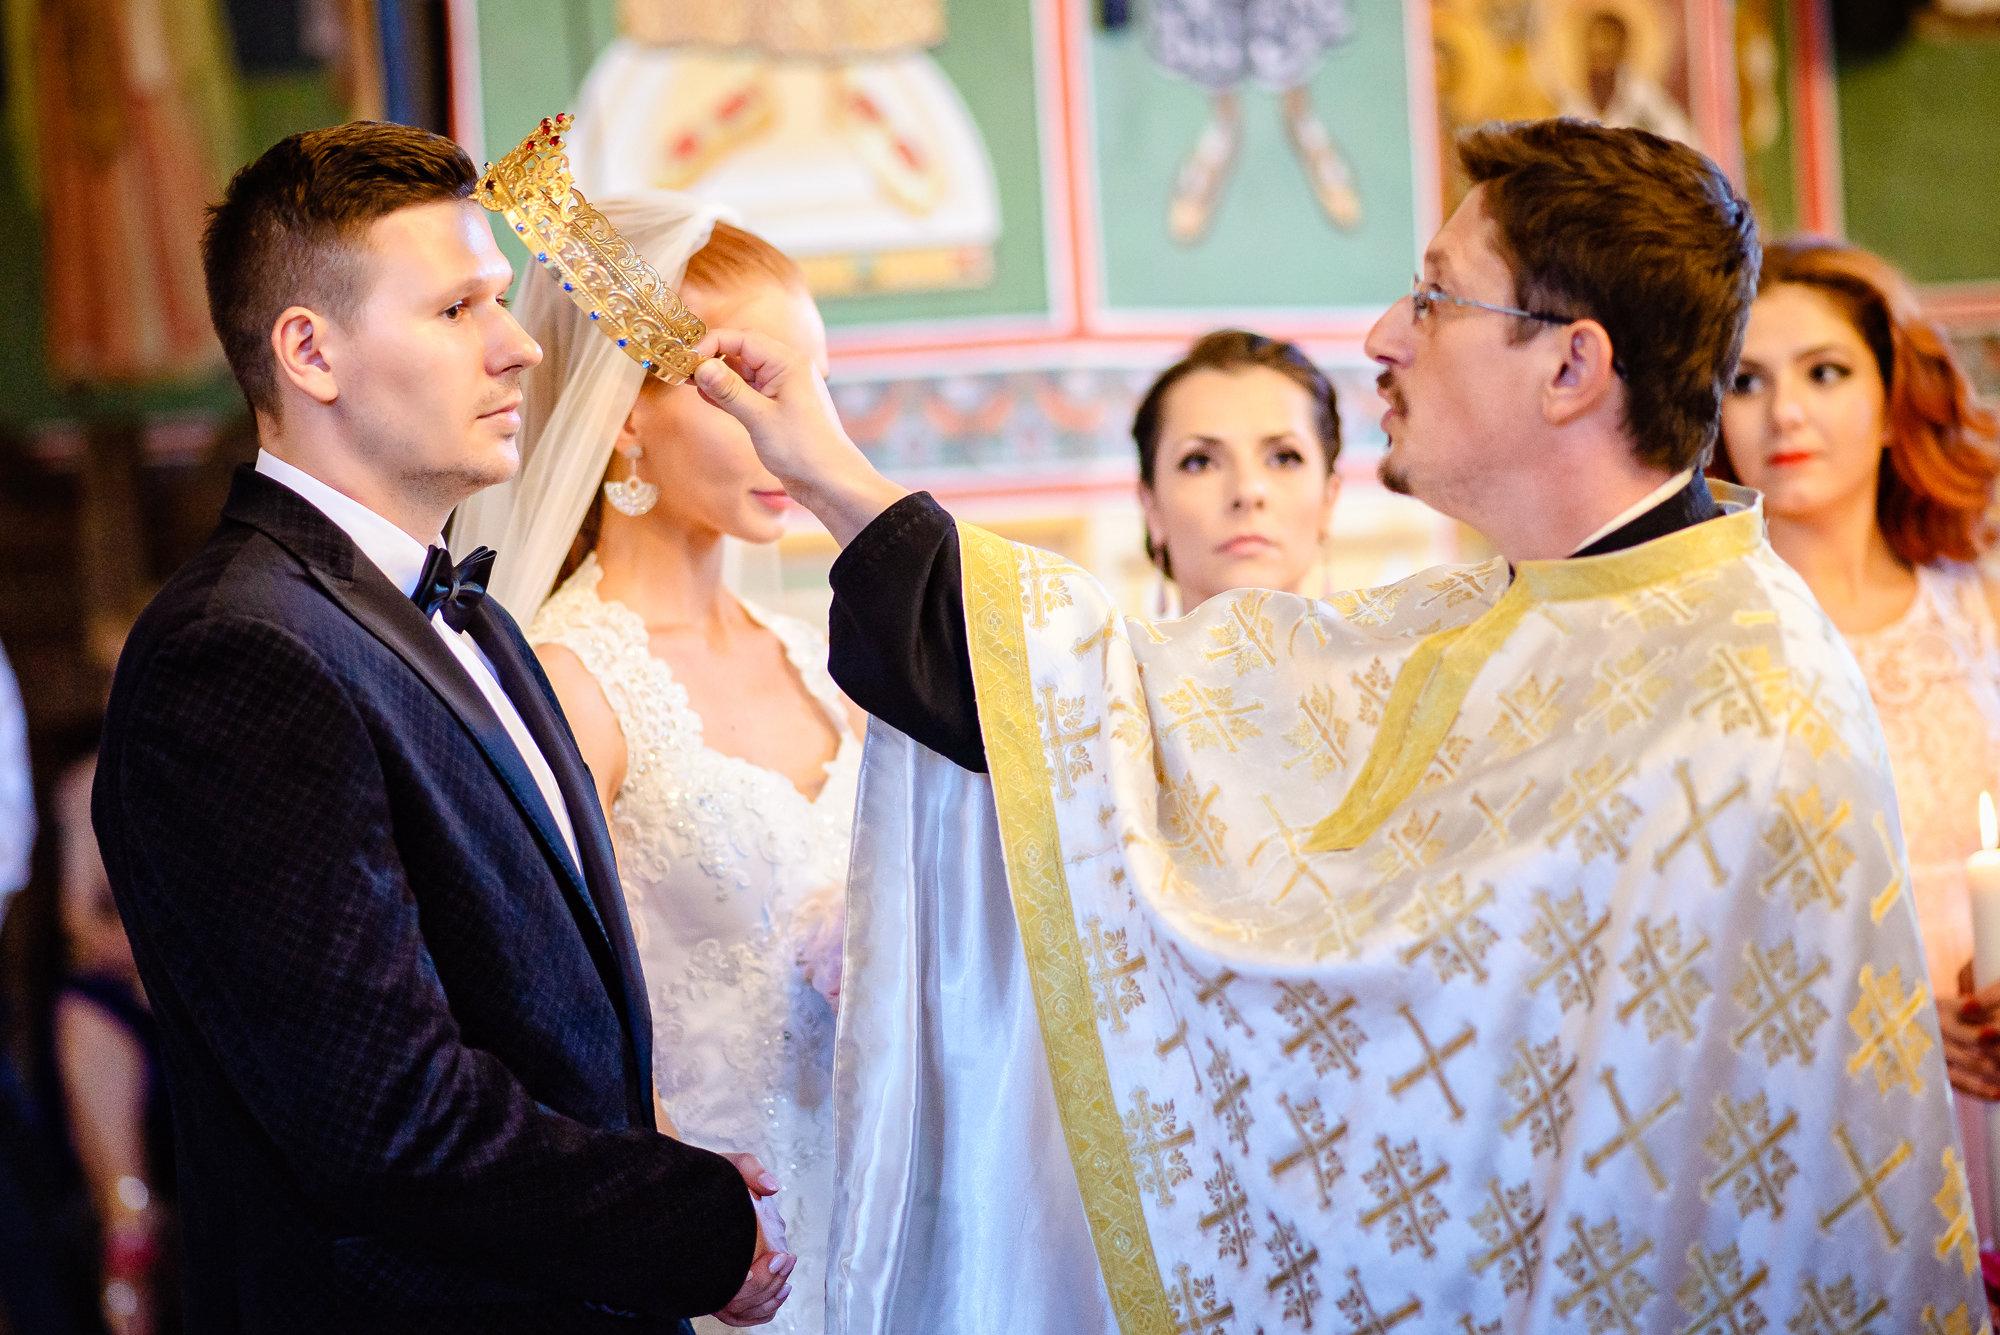 alexandru madalina wedding day 16 1